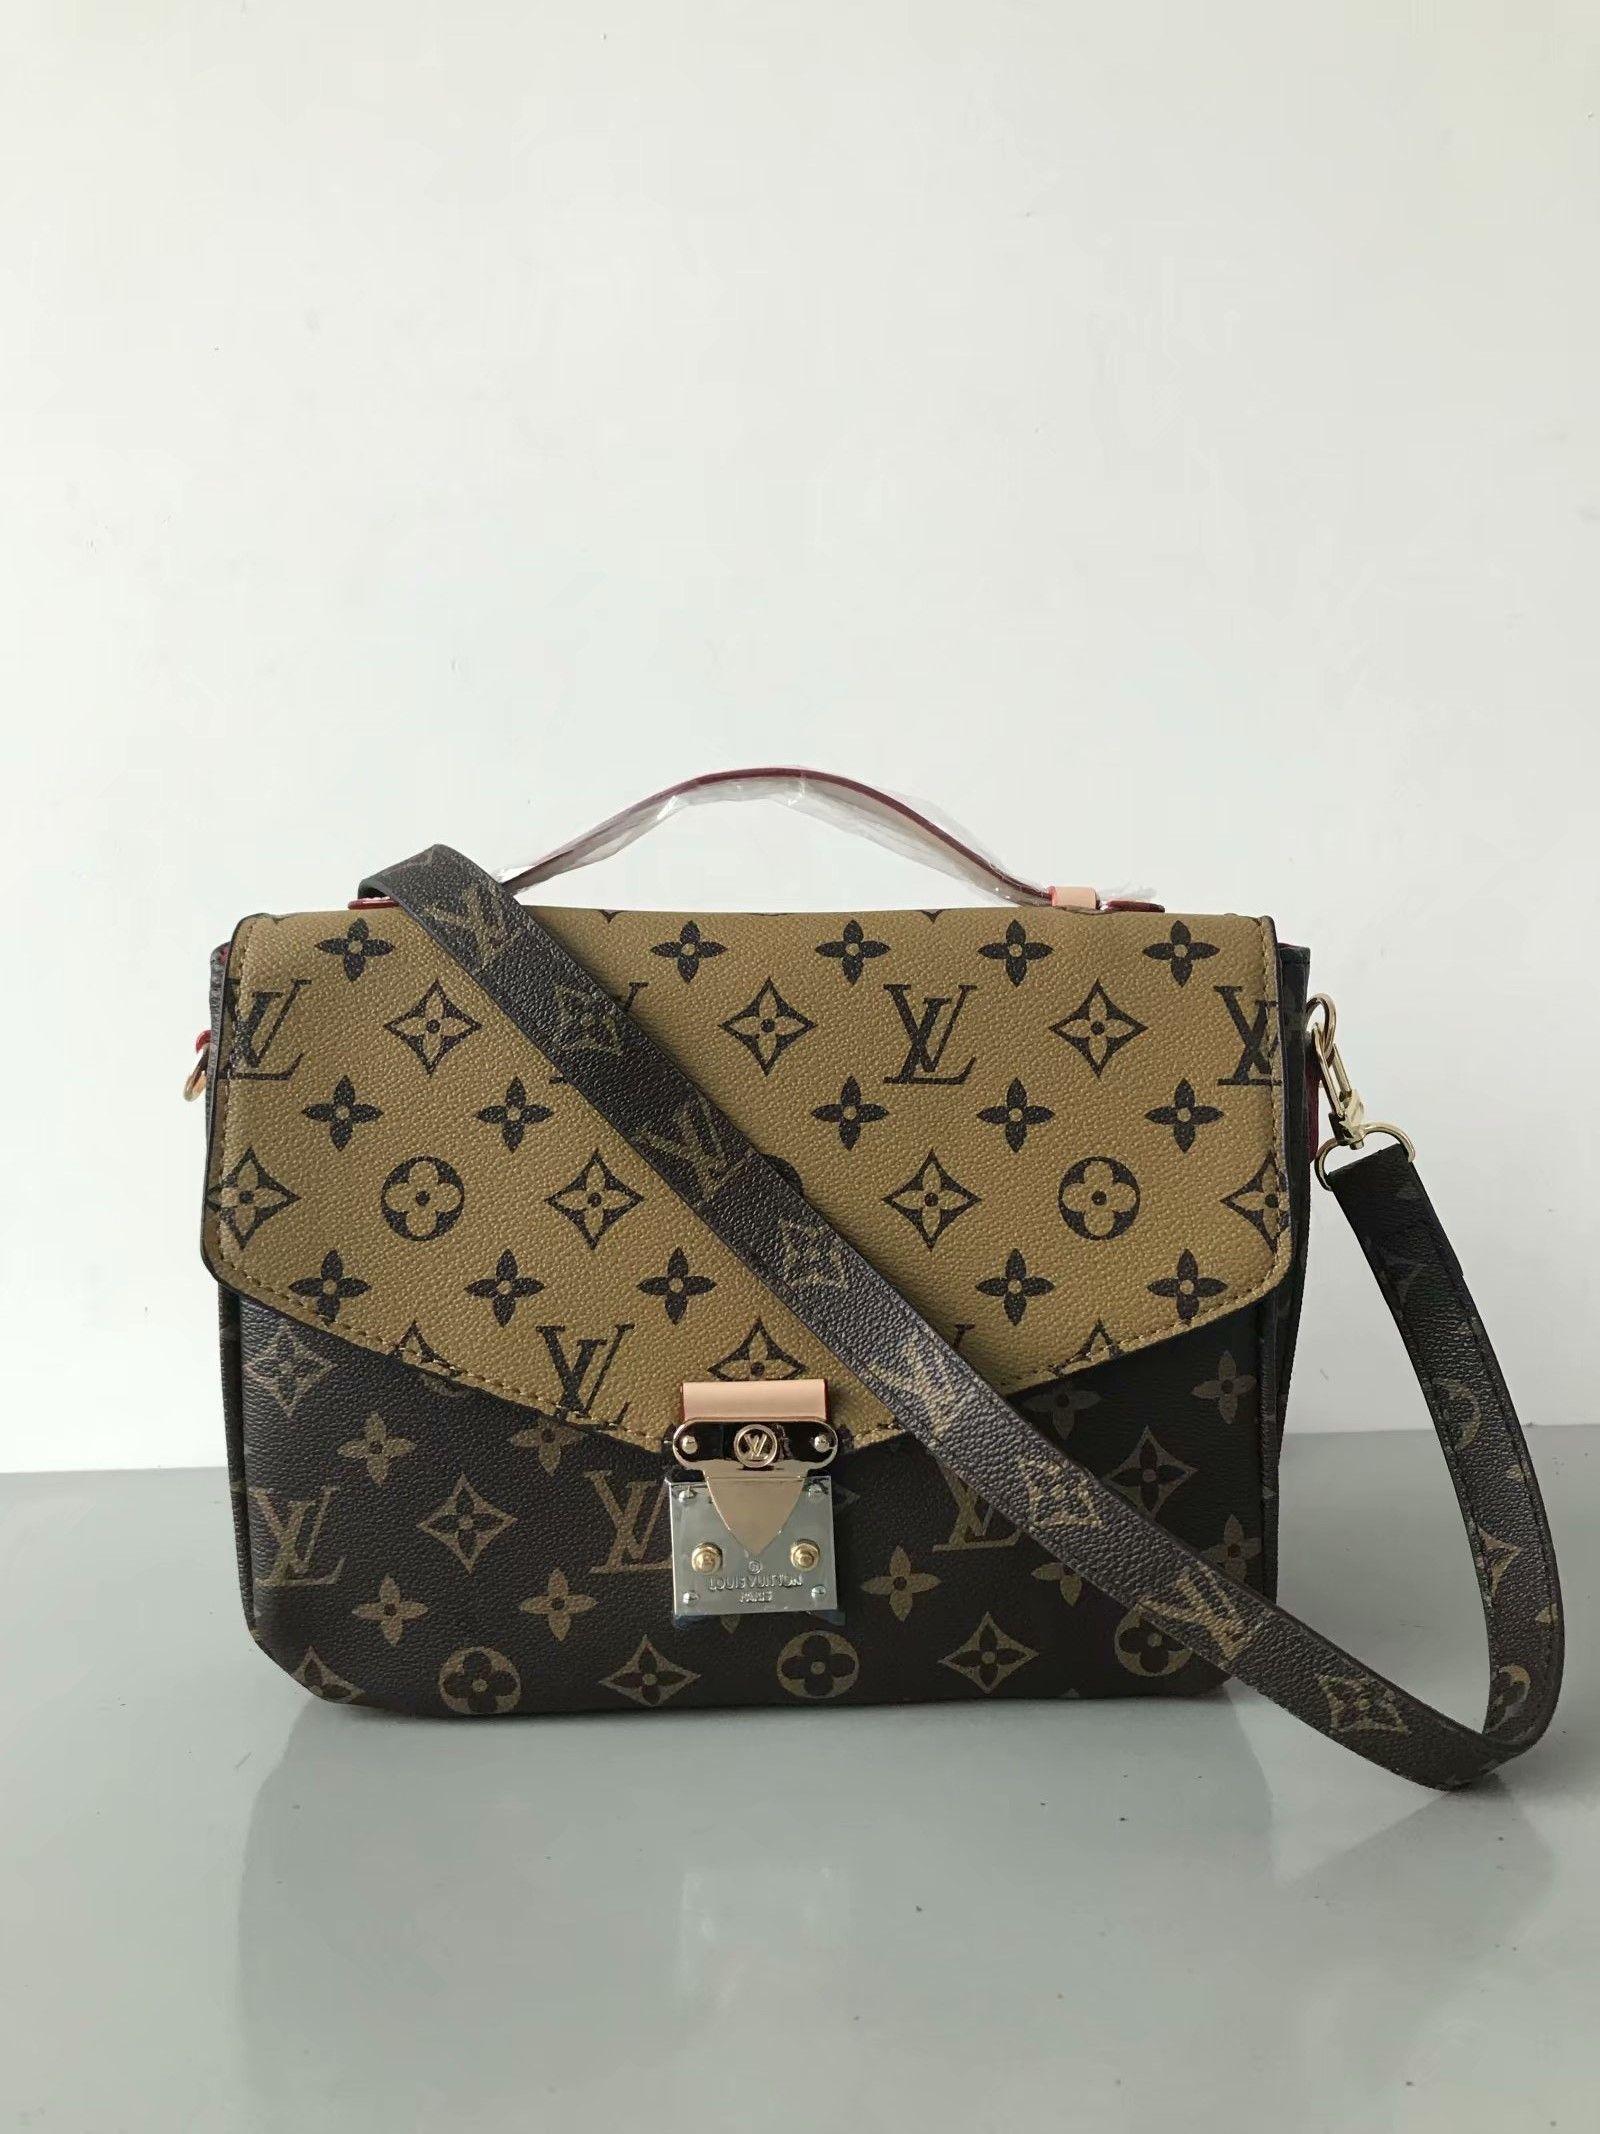 327227676dca Hot Sale Fashion Vintage Handbags Women Bags Designer Handbags Wallets For  Women Leather Chain Bag Crossbody And Shoulder Bags Purses Designer Handbags  From ...